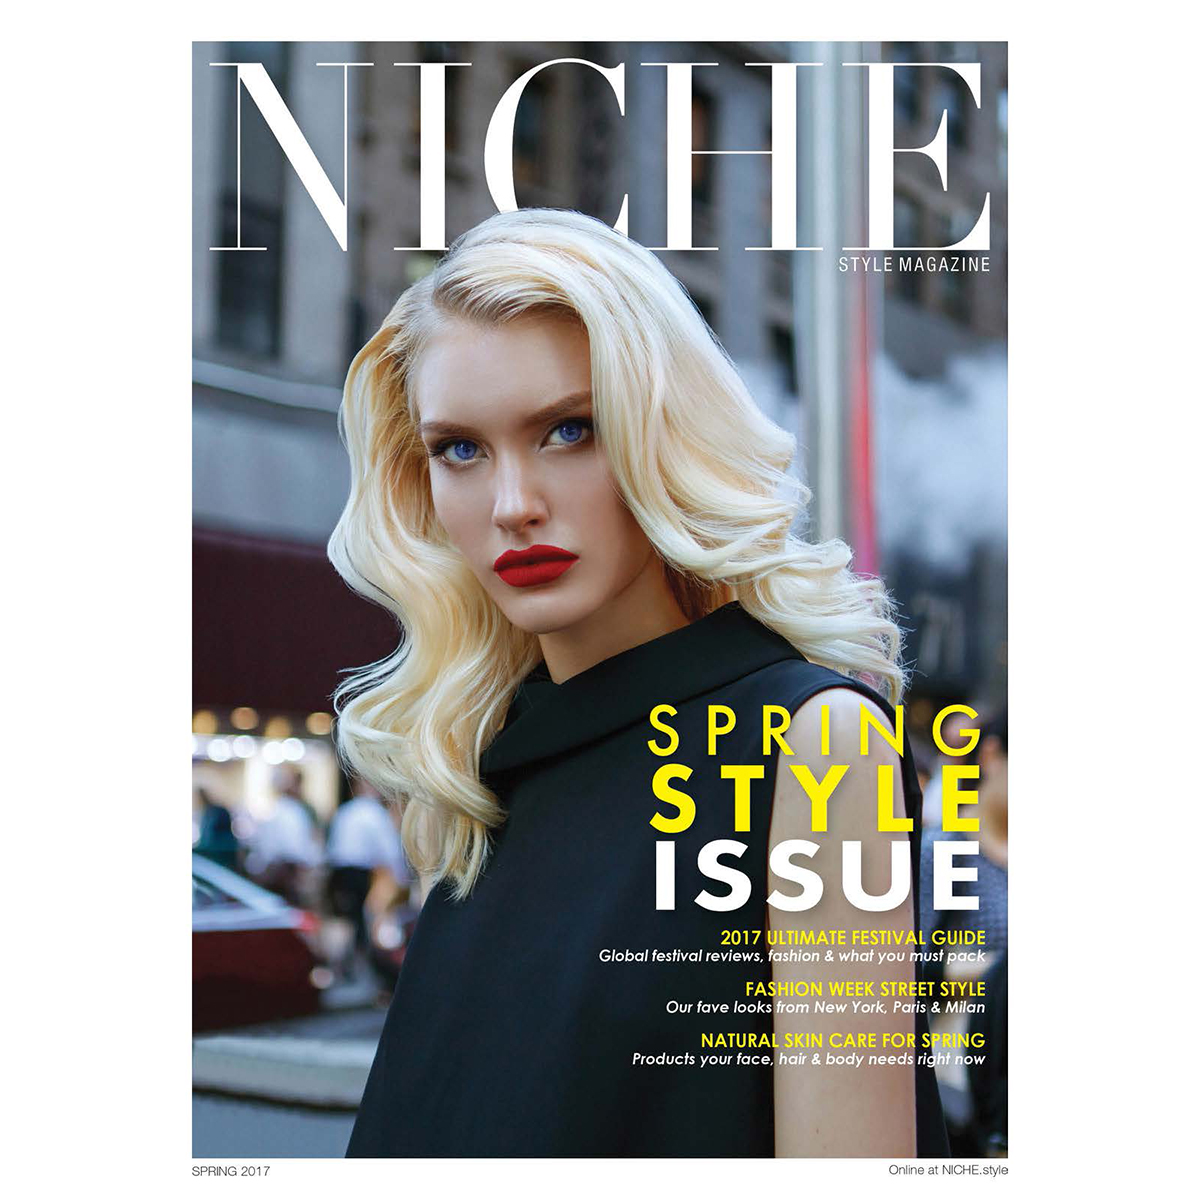 NICHE magazine Subscription - 6 Issues - NICHE magazine